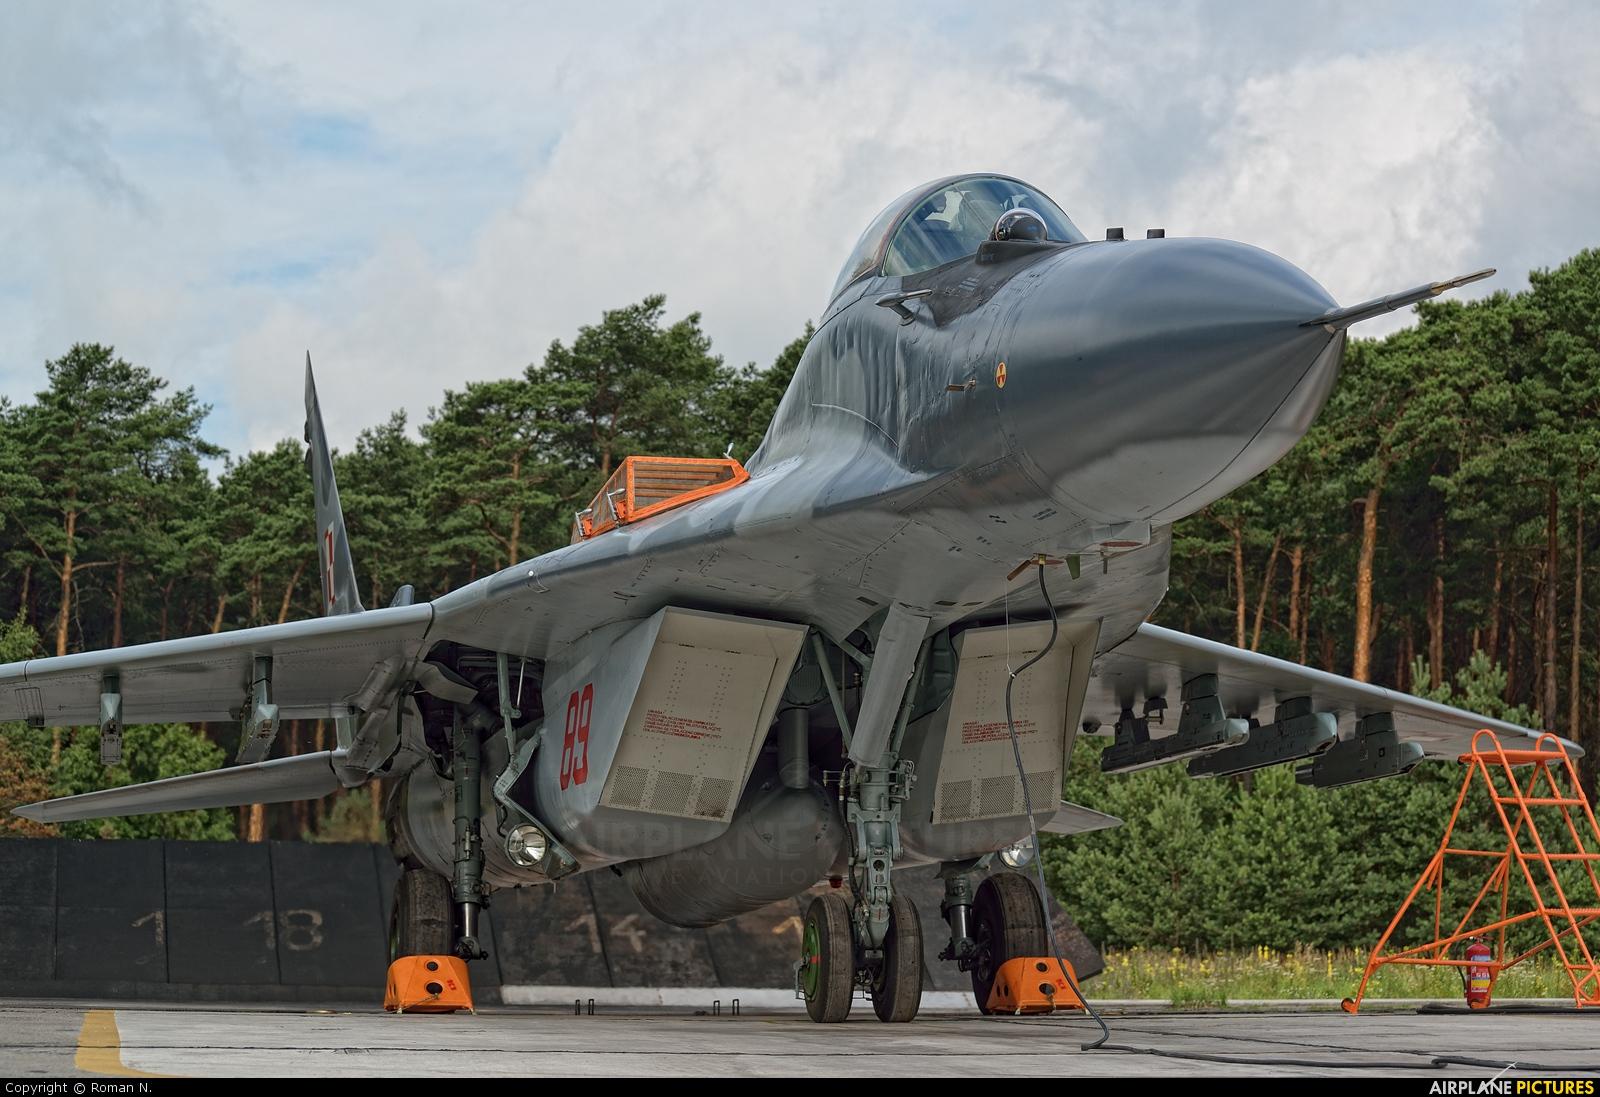 Poland - Air Force 89 aircraft at Bydgoszcz - Szwederowo